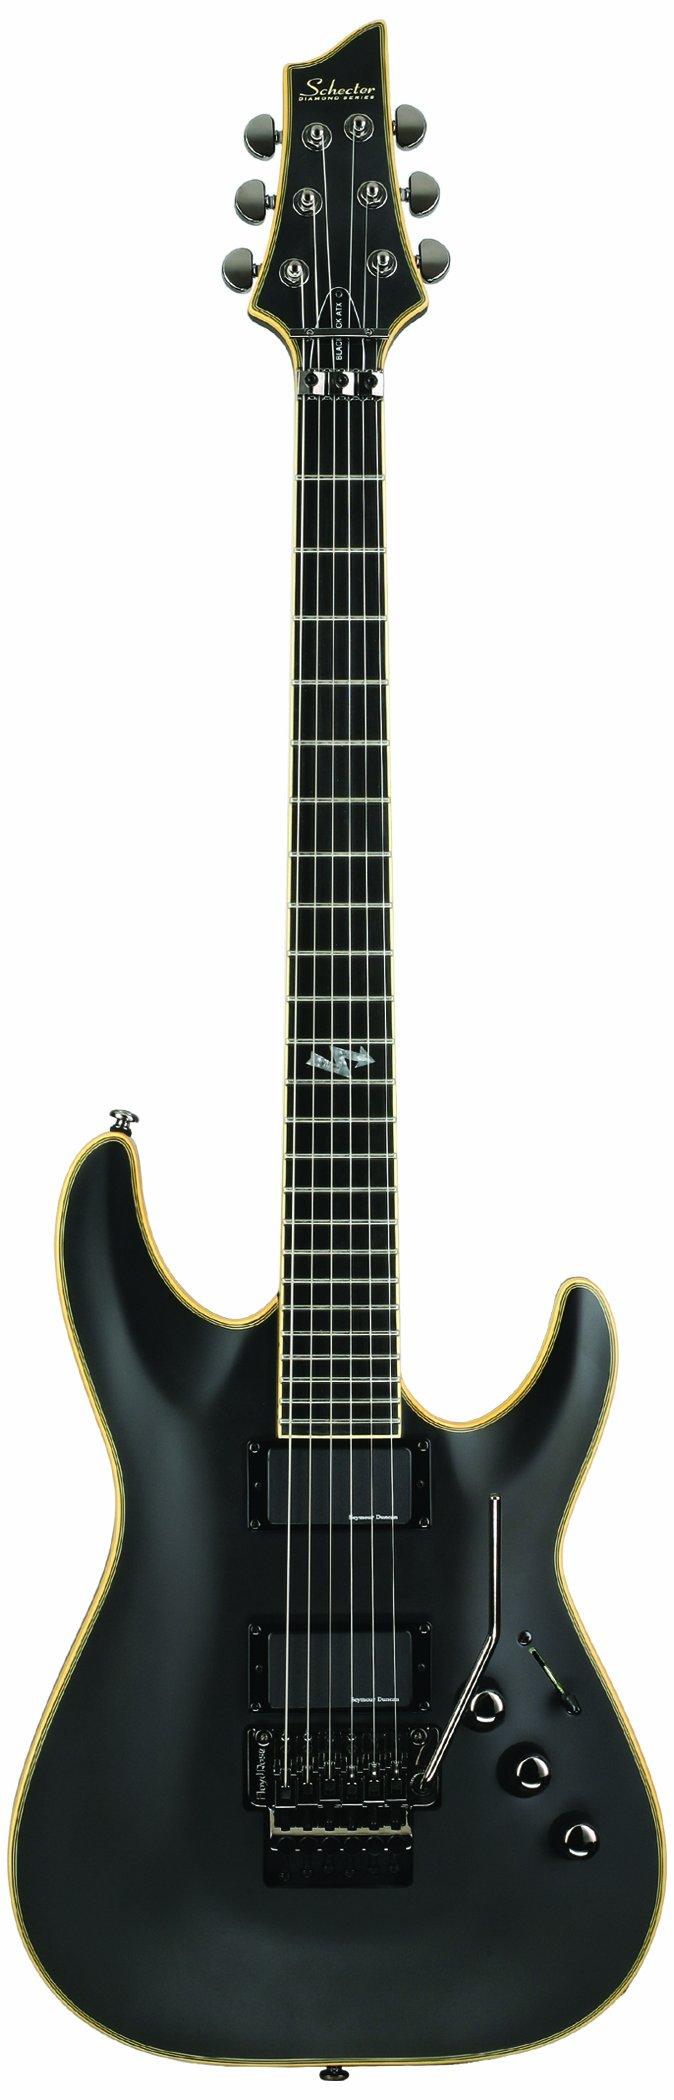 Cheap Schecter Blackjack ATX C-1 FR Electric Guitar Aged Black Satin (ABSN) Black Friday & Cyber Monday 2019